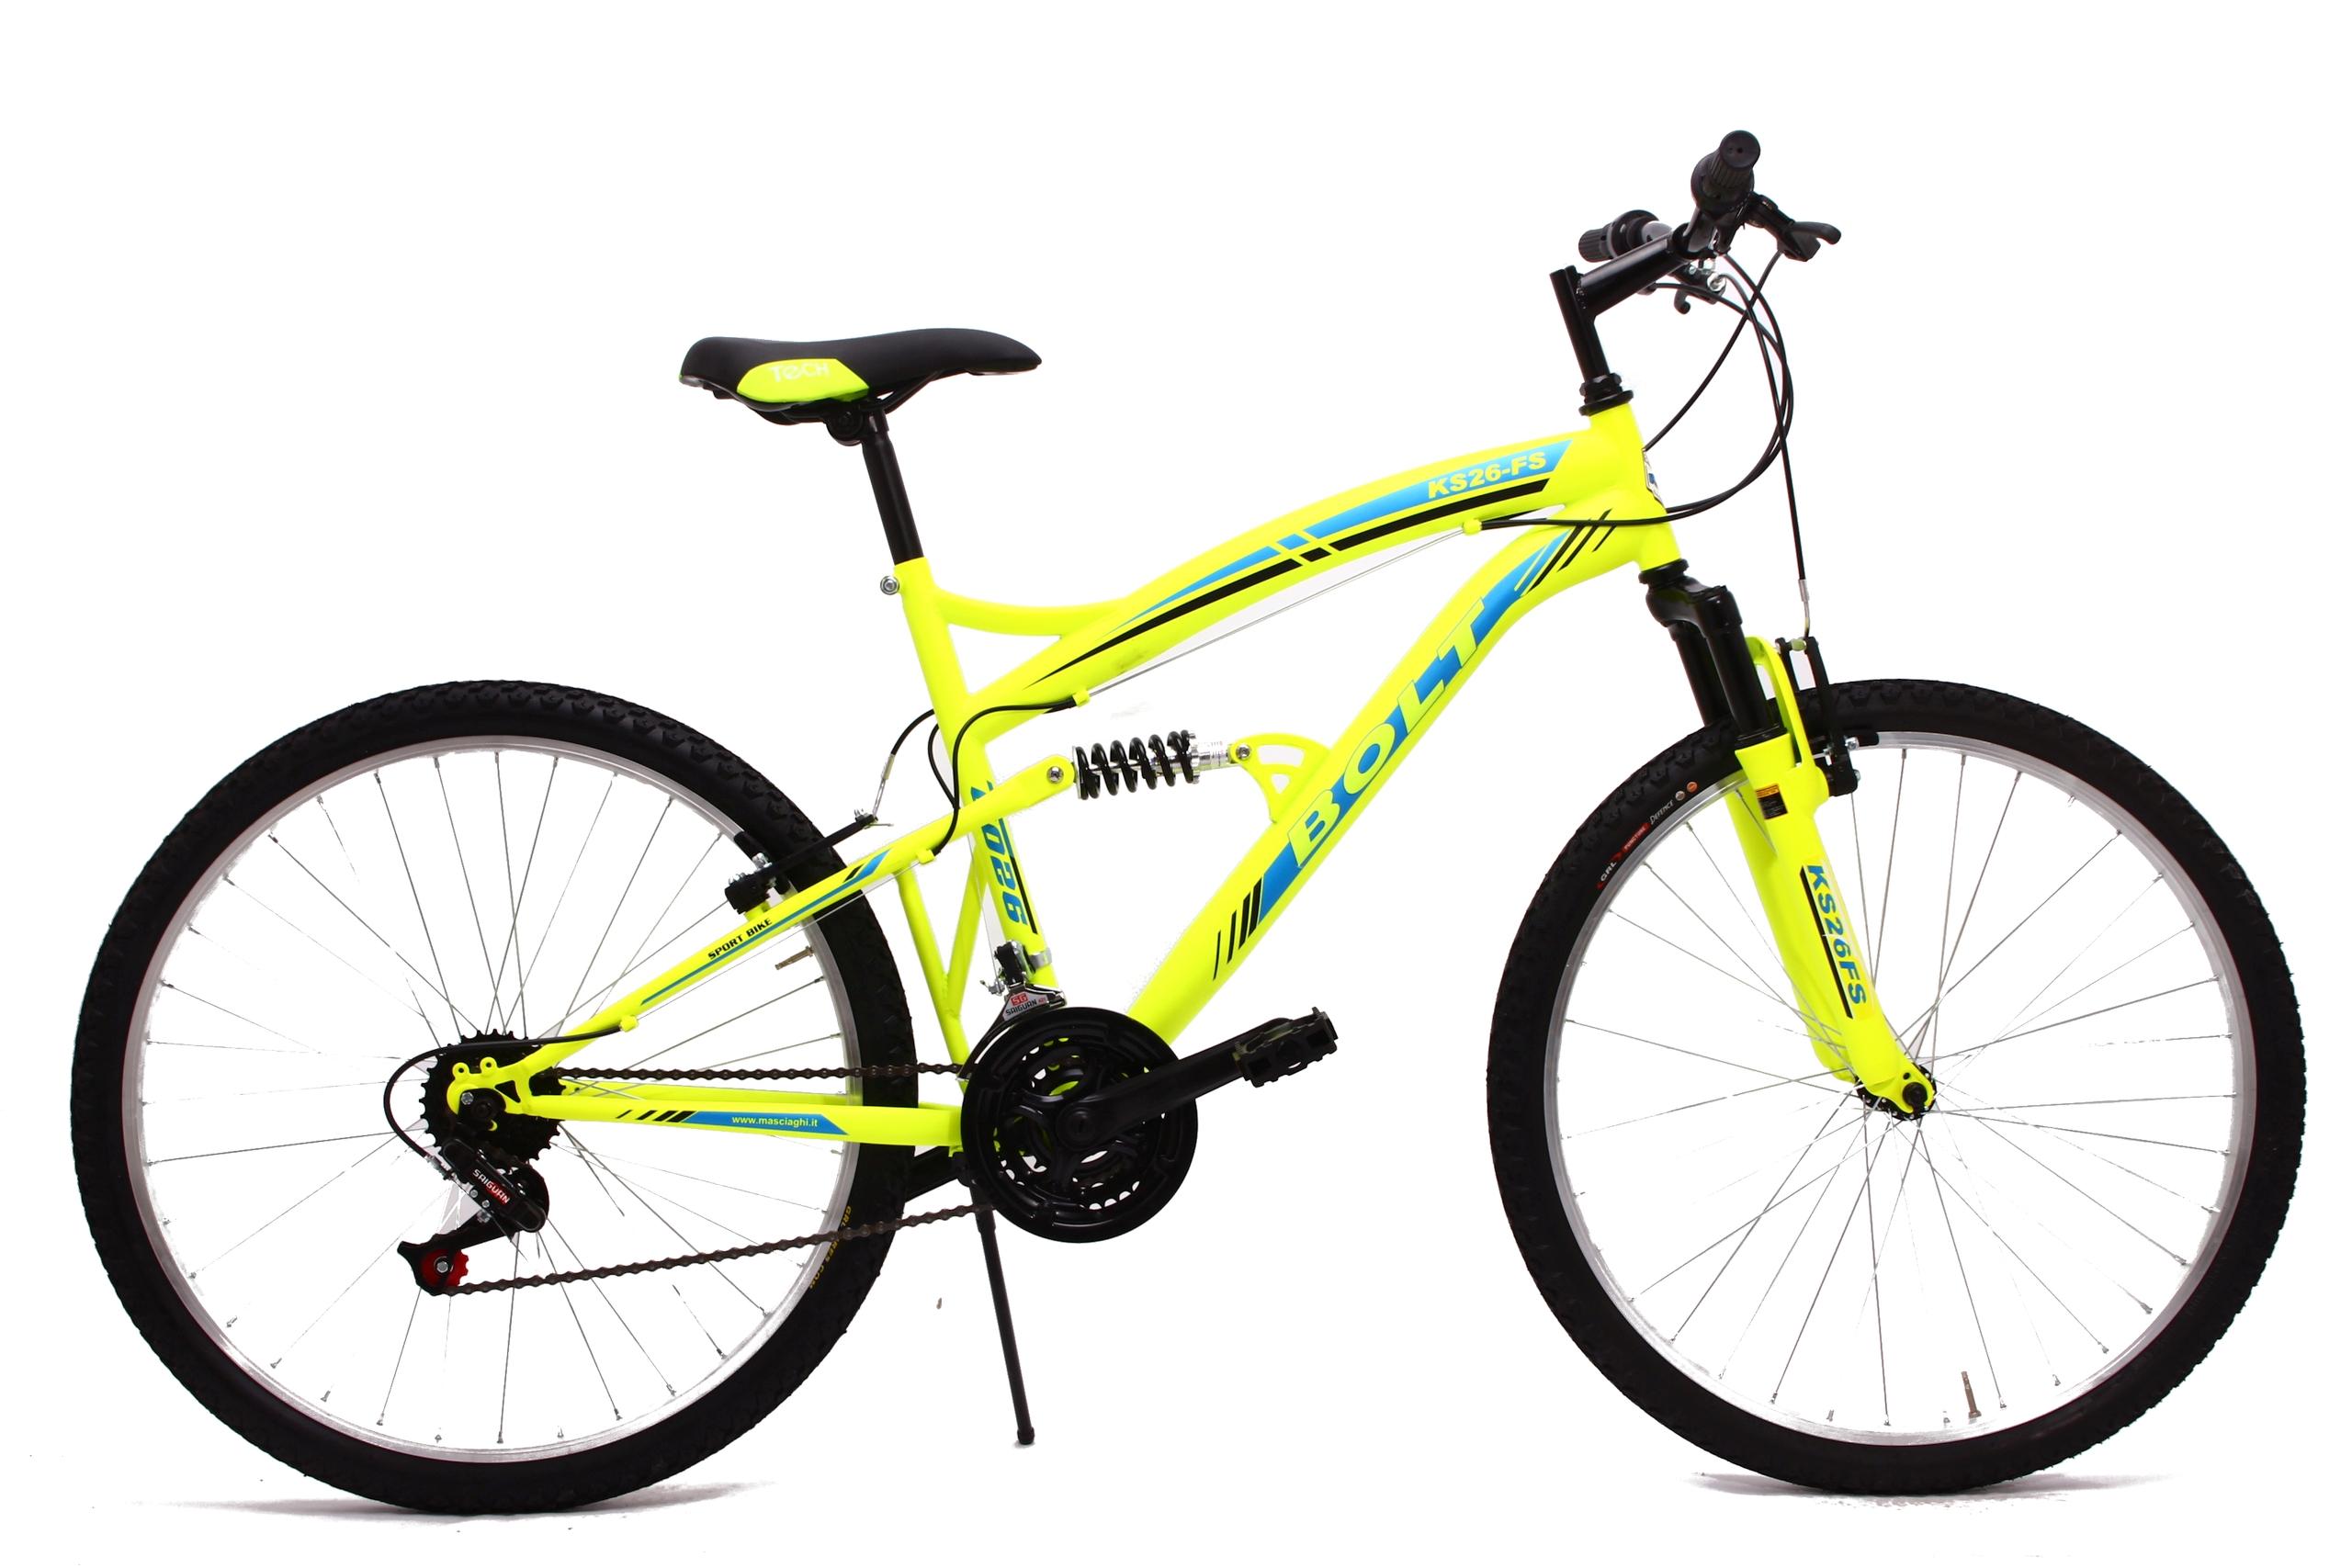 Rower Górski Bolt 26 7183164251 Oficjalne Archiwum Allegro